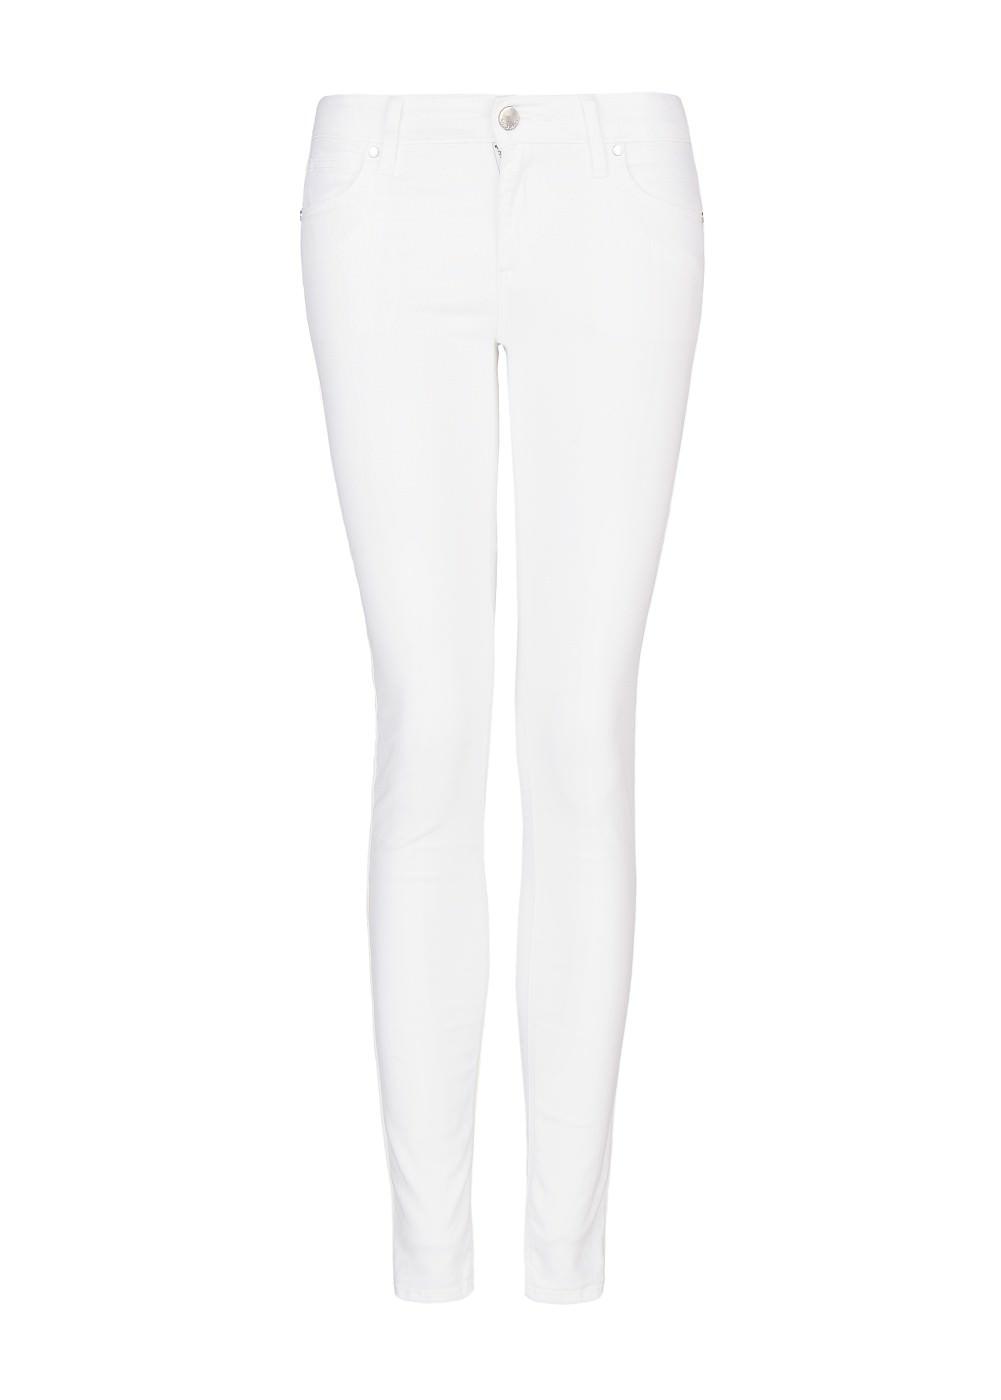 MANGO - CLOTHING - Jackets - Super slim-fit Elektra jeans